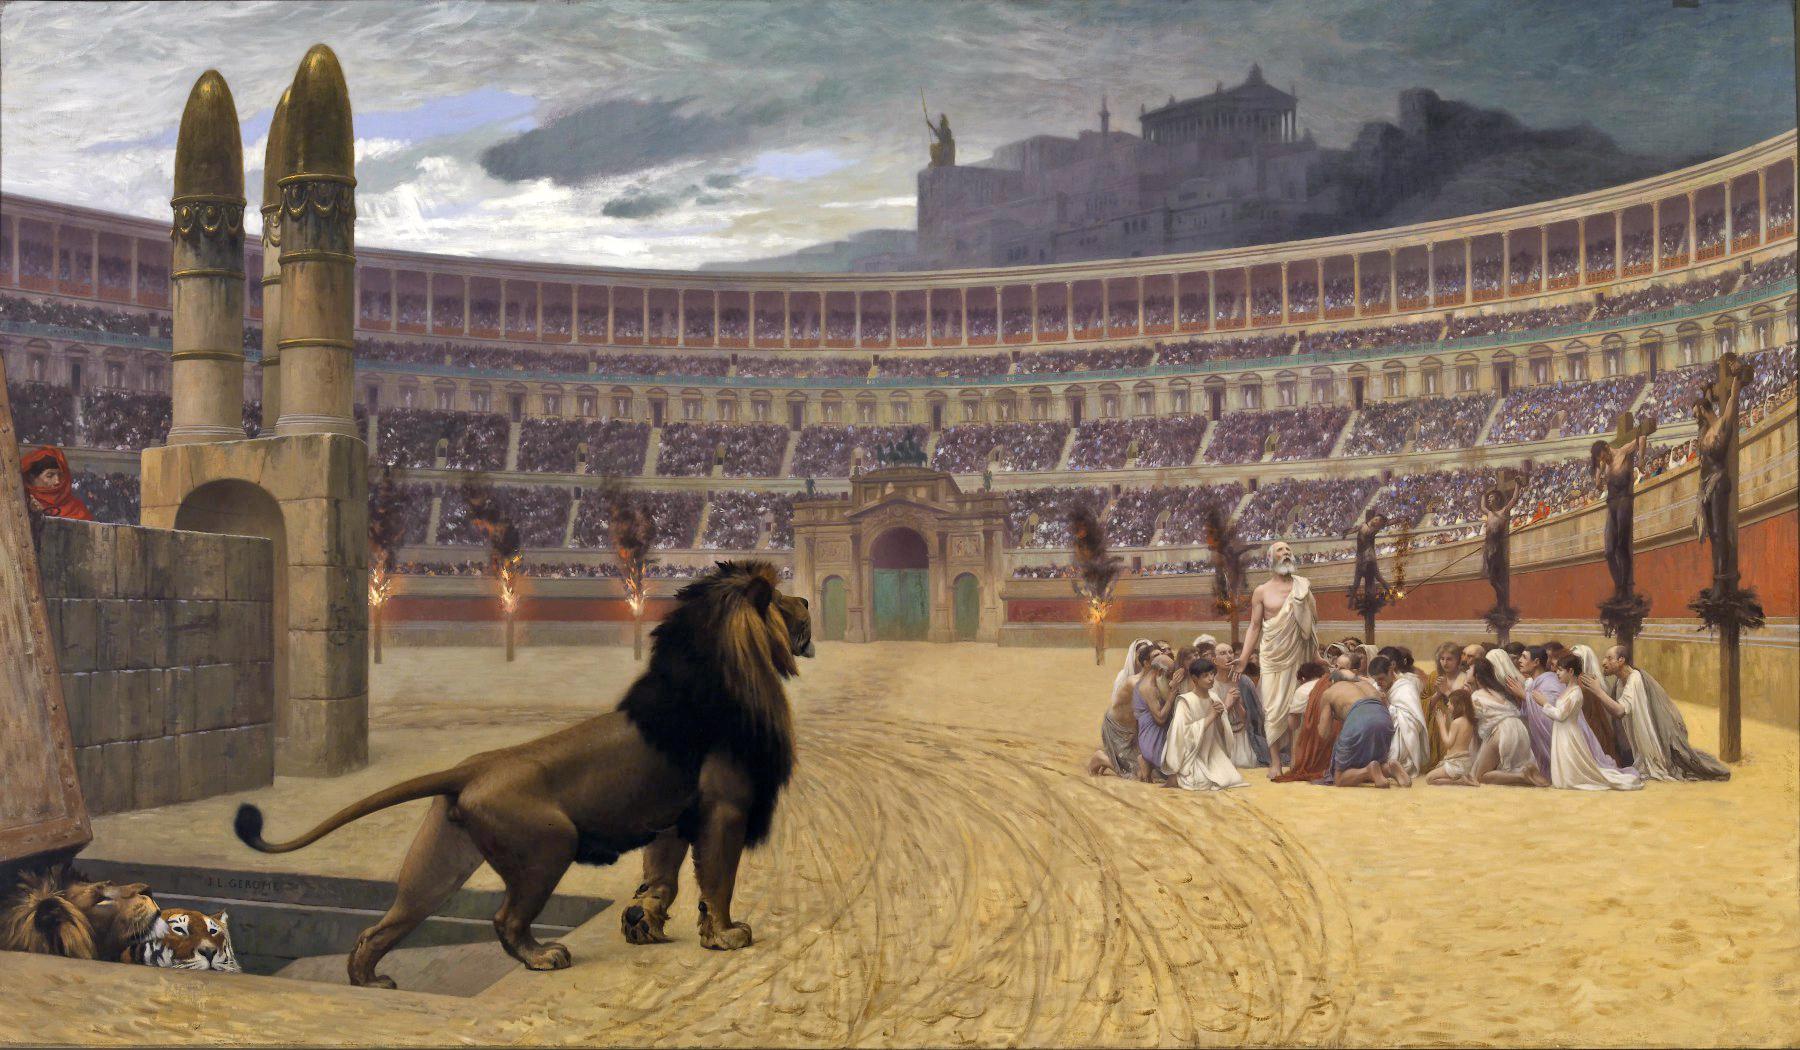 Persecuzione Cristiani Antica Roma Pagana Jean-Léon Gérôme